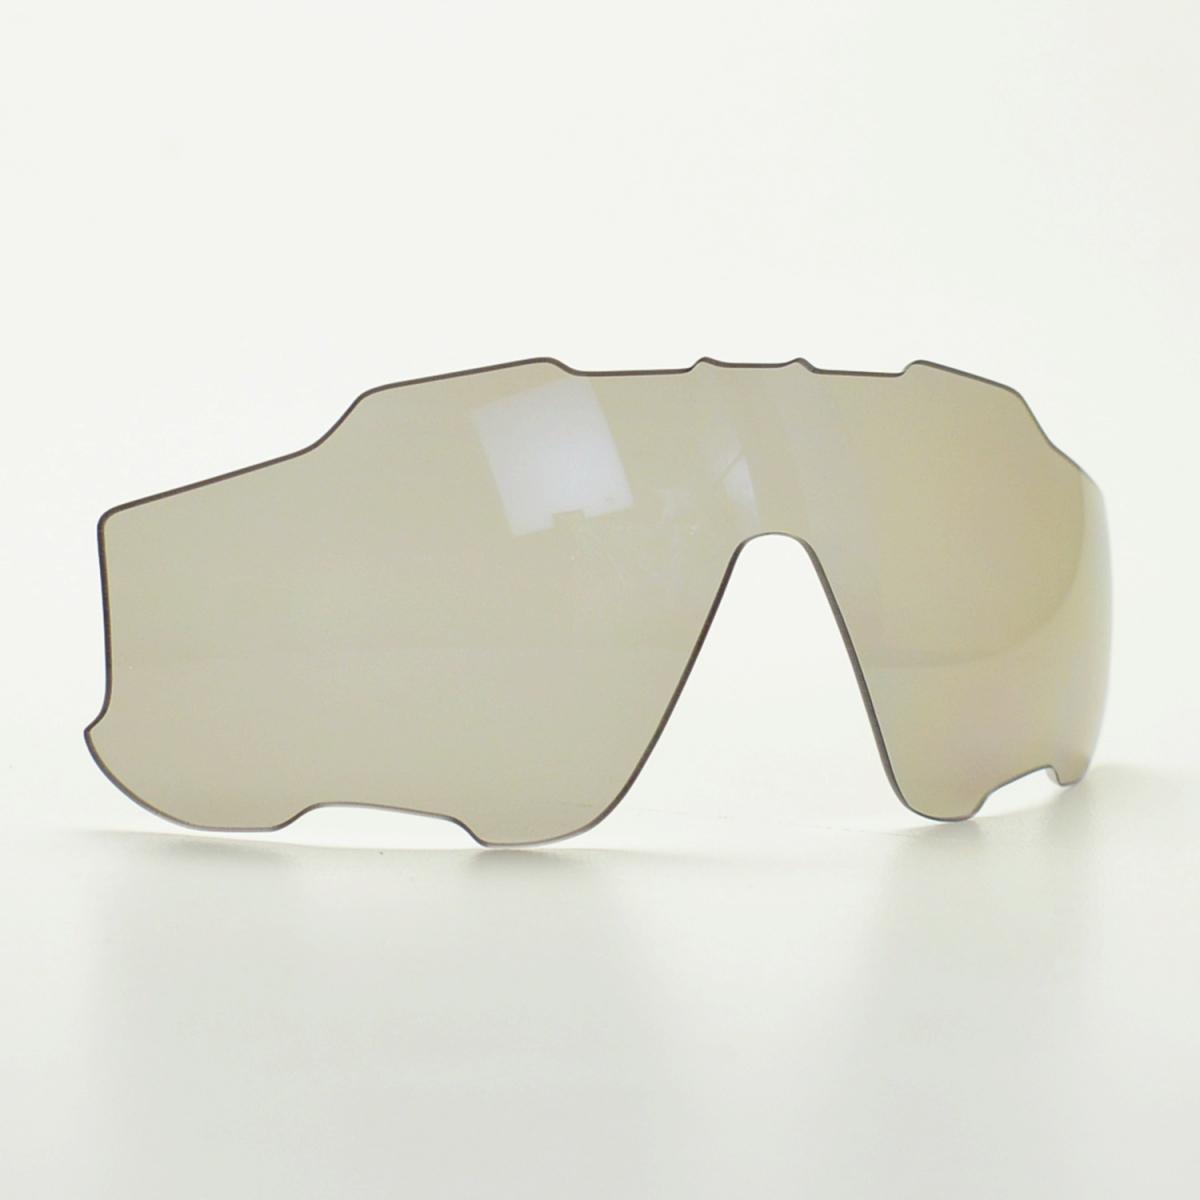 GOODMAN LENS MANUFACTURE グッドマンレンズマニュファクチュア JAWBREAKER用交換レンズ 偏光ライトグレーGOODMAN LENS MANUFACTURE グッドマンレンズマニュファクチュア レンズ 調光 偏光 OAKLEY オークリー 交換レンズ